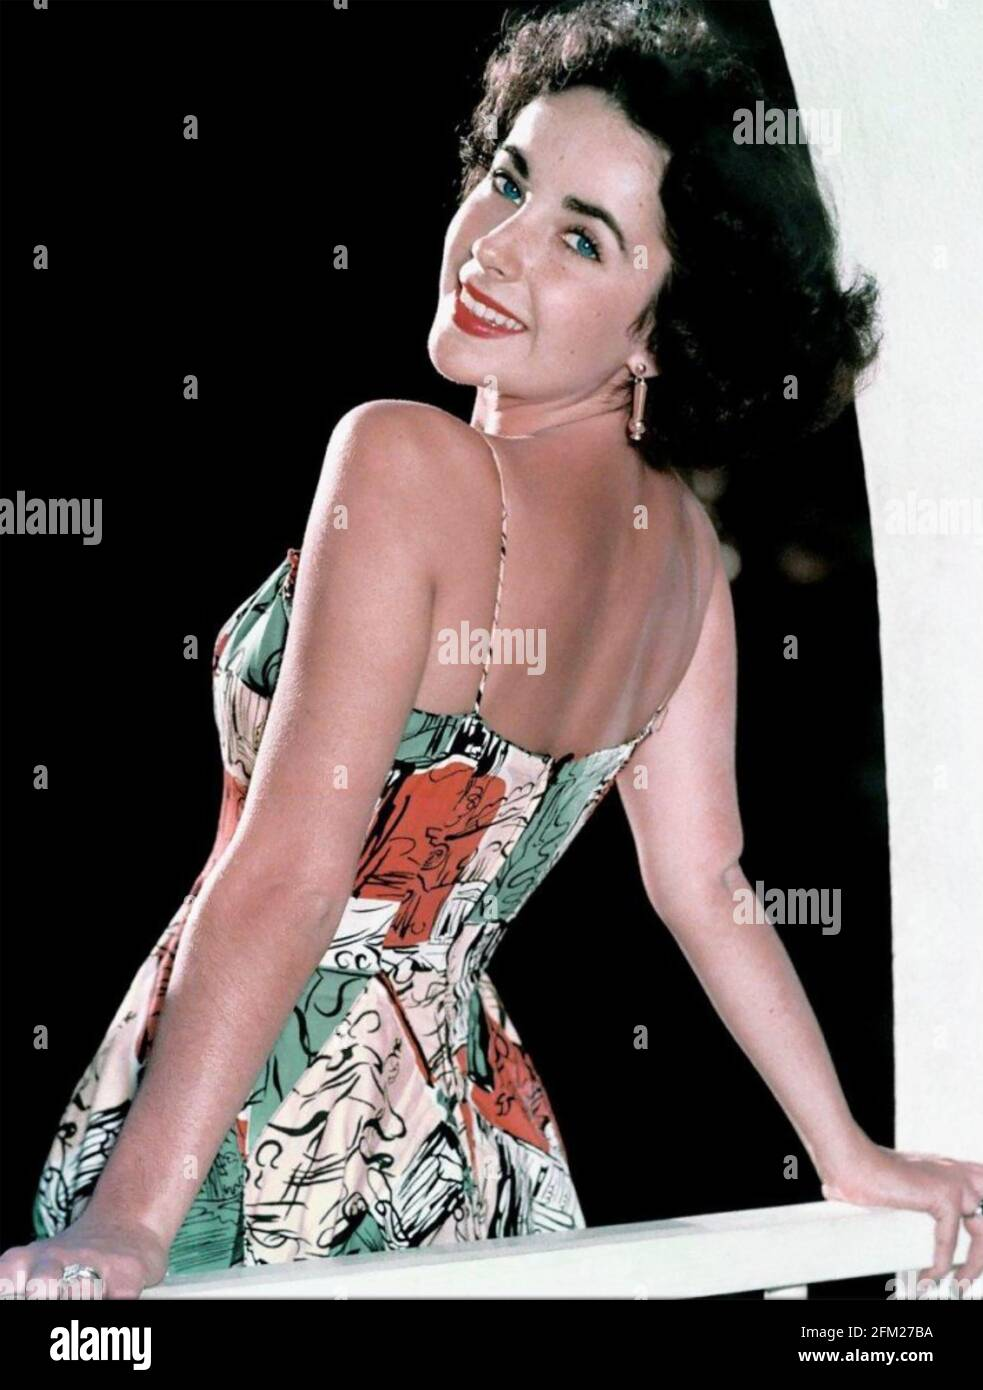 ELIZABETH TAYLOR (1932-2011) Actrice anglo-américaines vers 1950 Banque D'Images